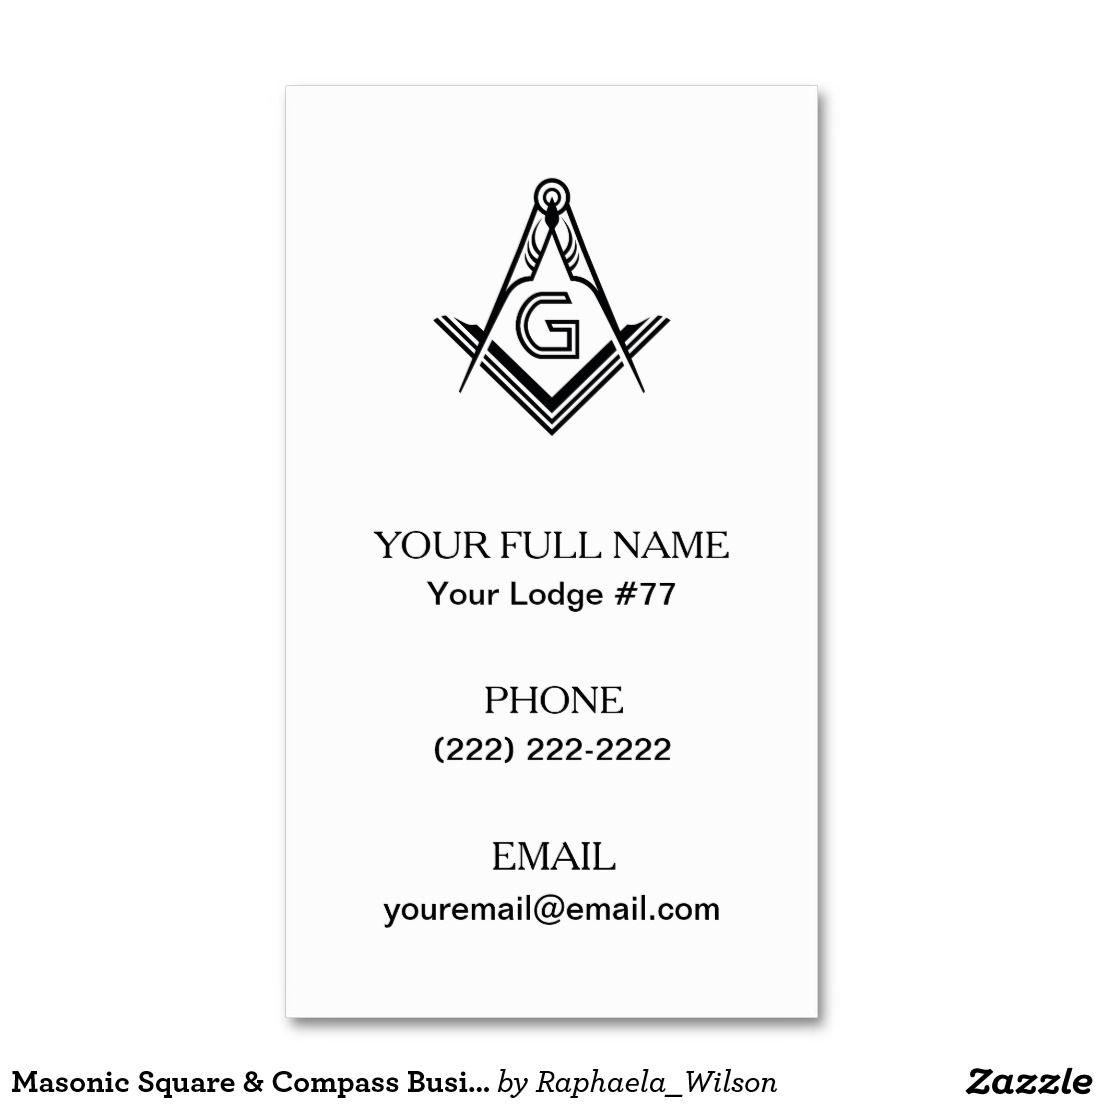 Masonic Square & Compass Business Cards, Freemason Business Card ...